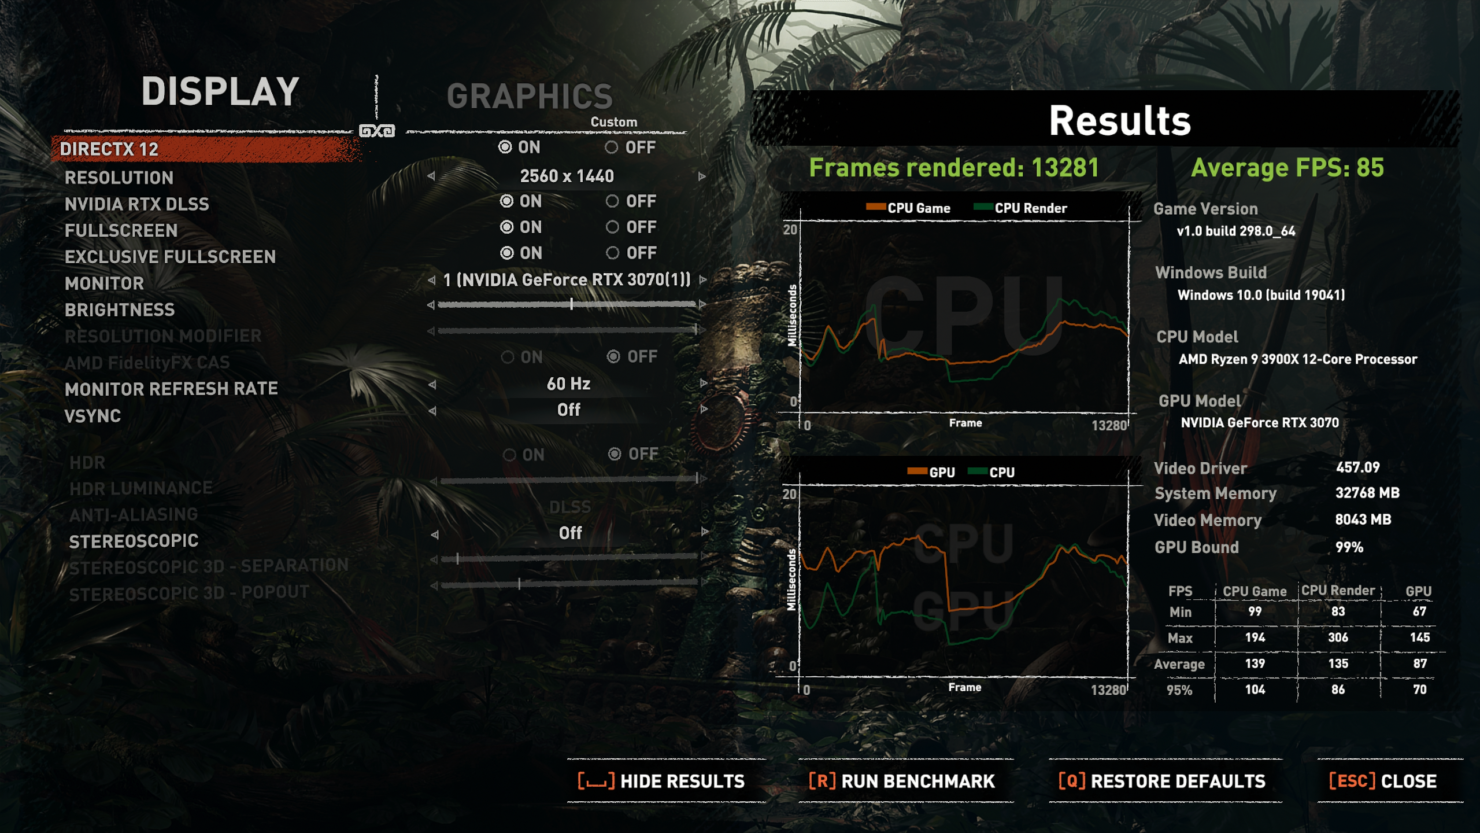 nvidia-geforce-rtx-3070-raytracing-benchmark_wqhd